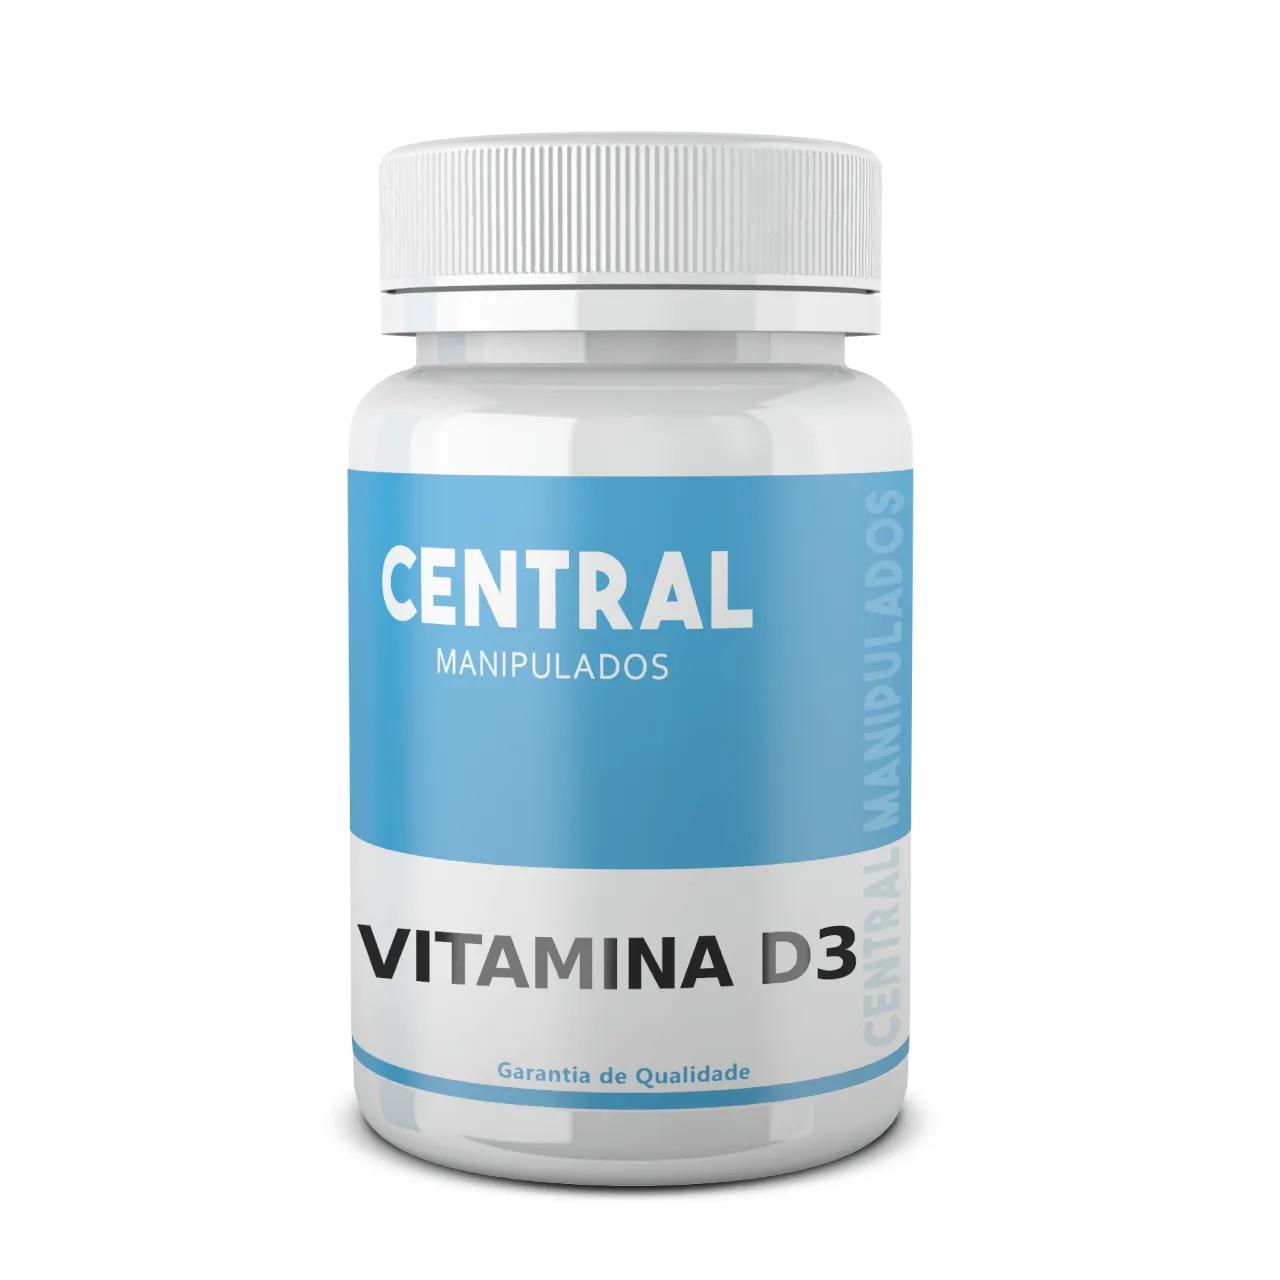 Vitamina D3 2.000 UI - 120 cápsulas - Saúde Óssea e Muscular